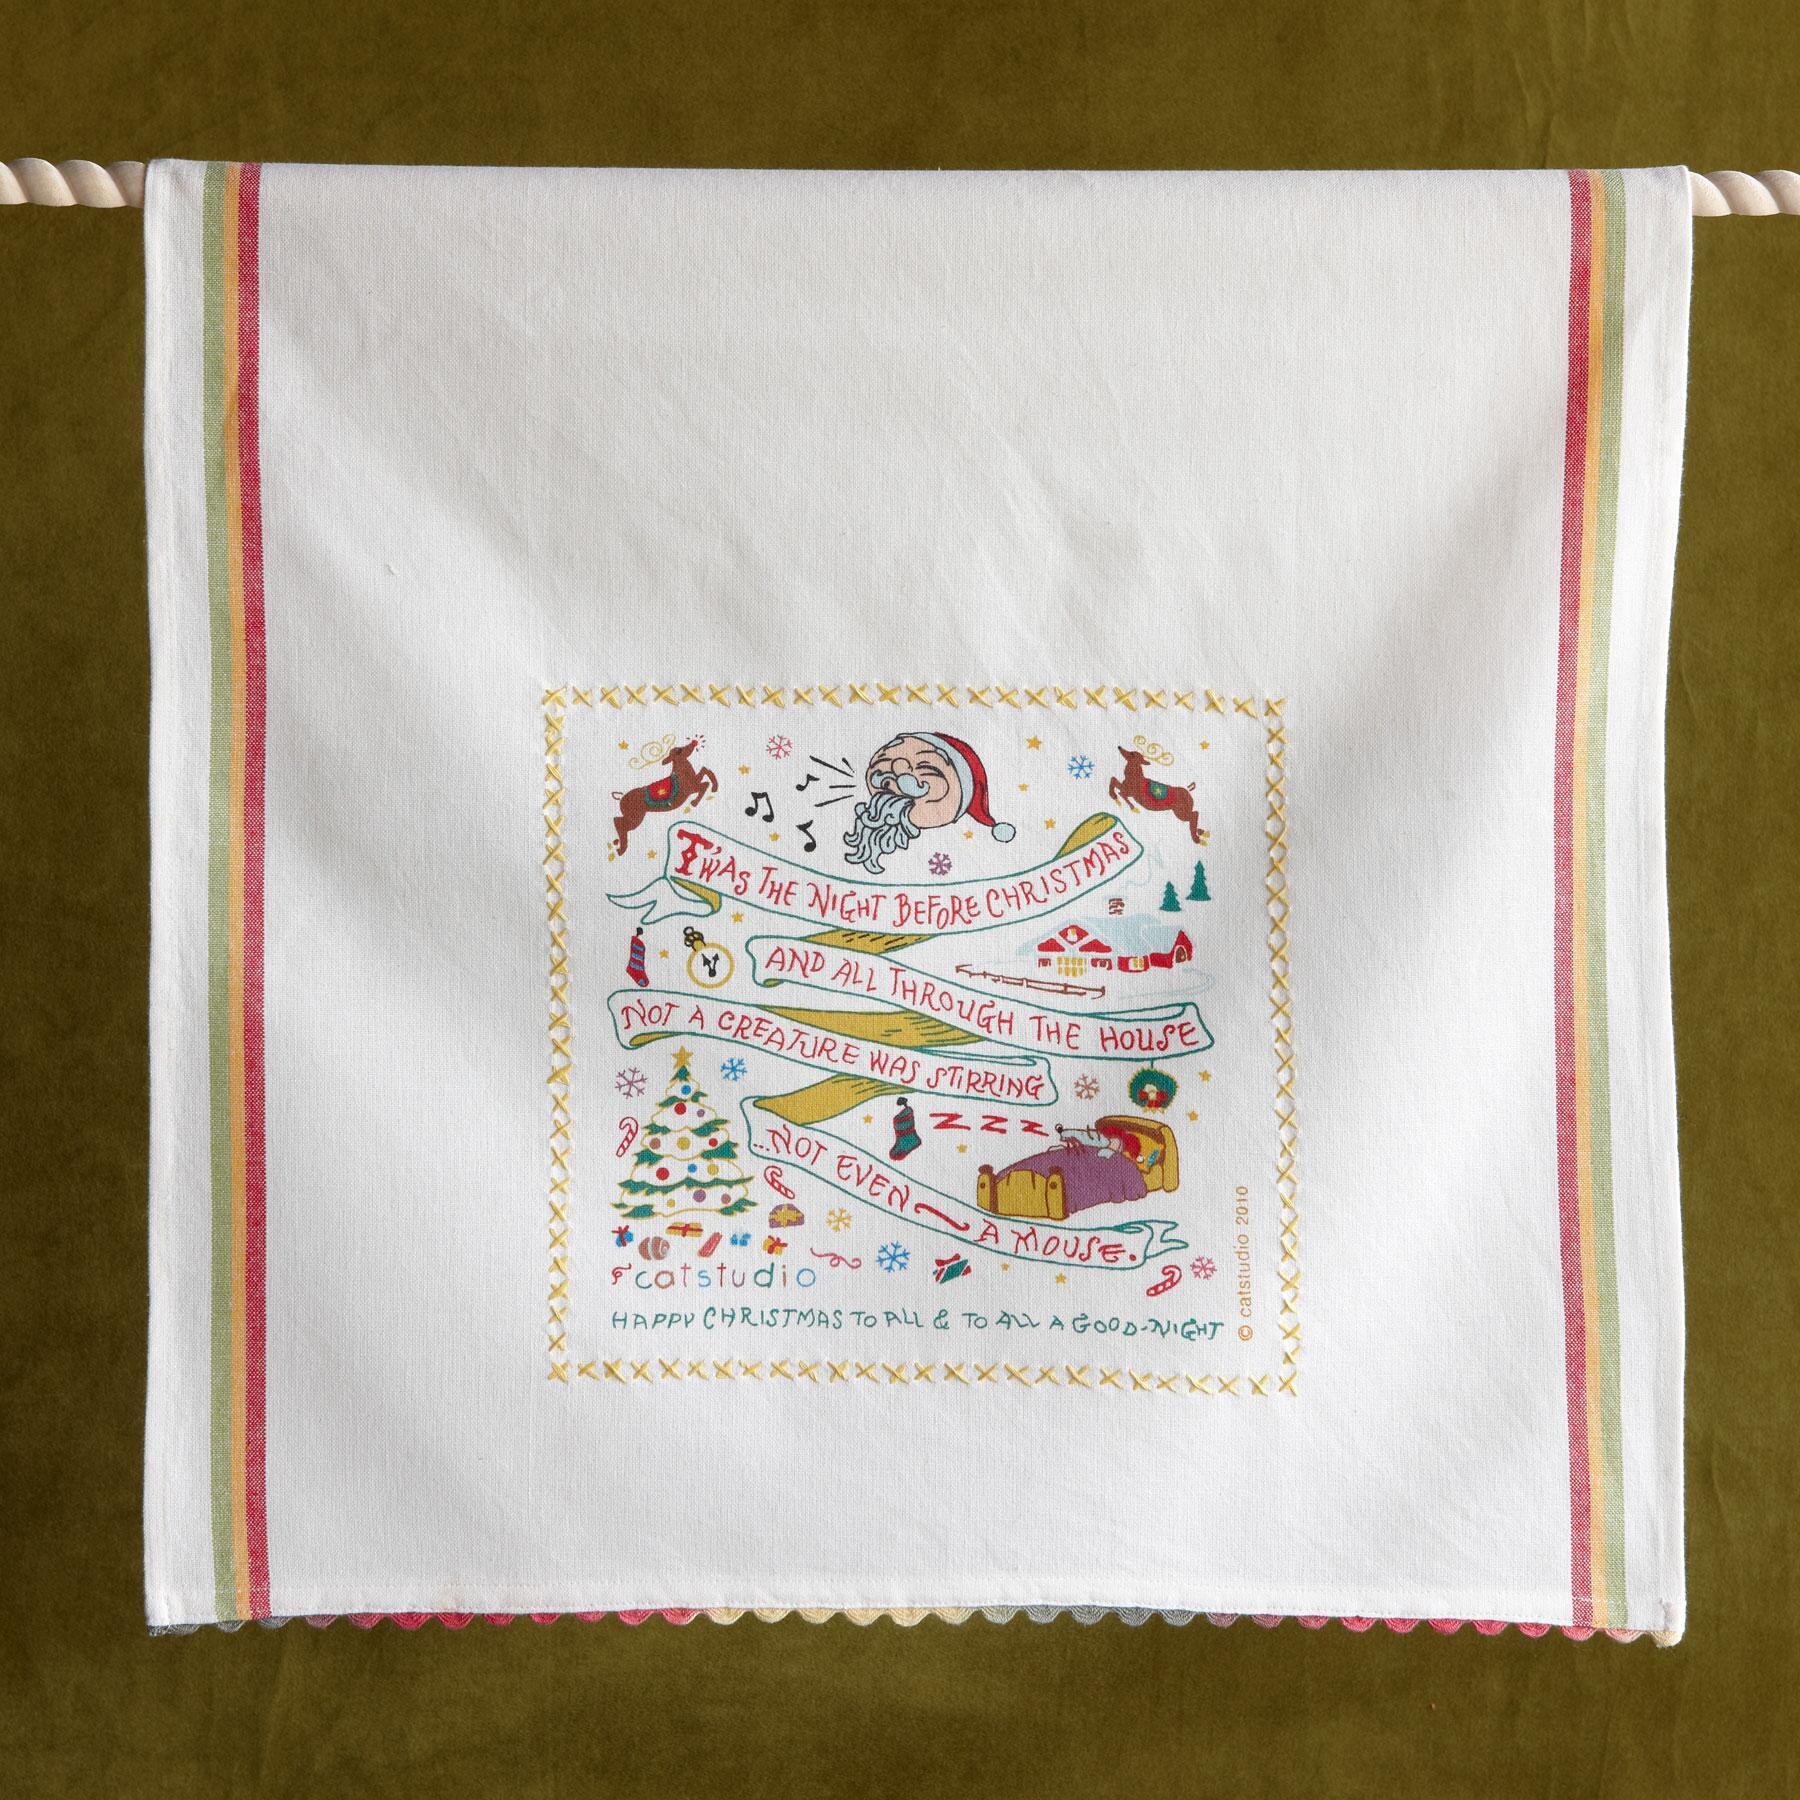 SOUVENIR CHRISTMAS TEA TOWEL: View 1